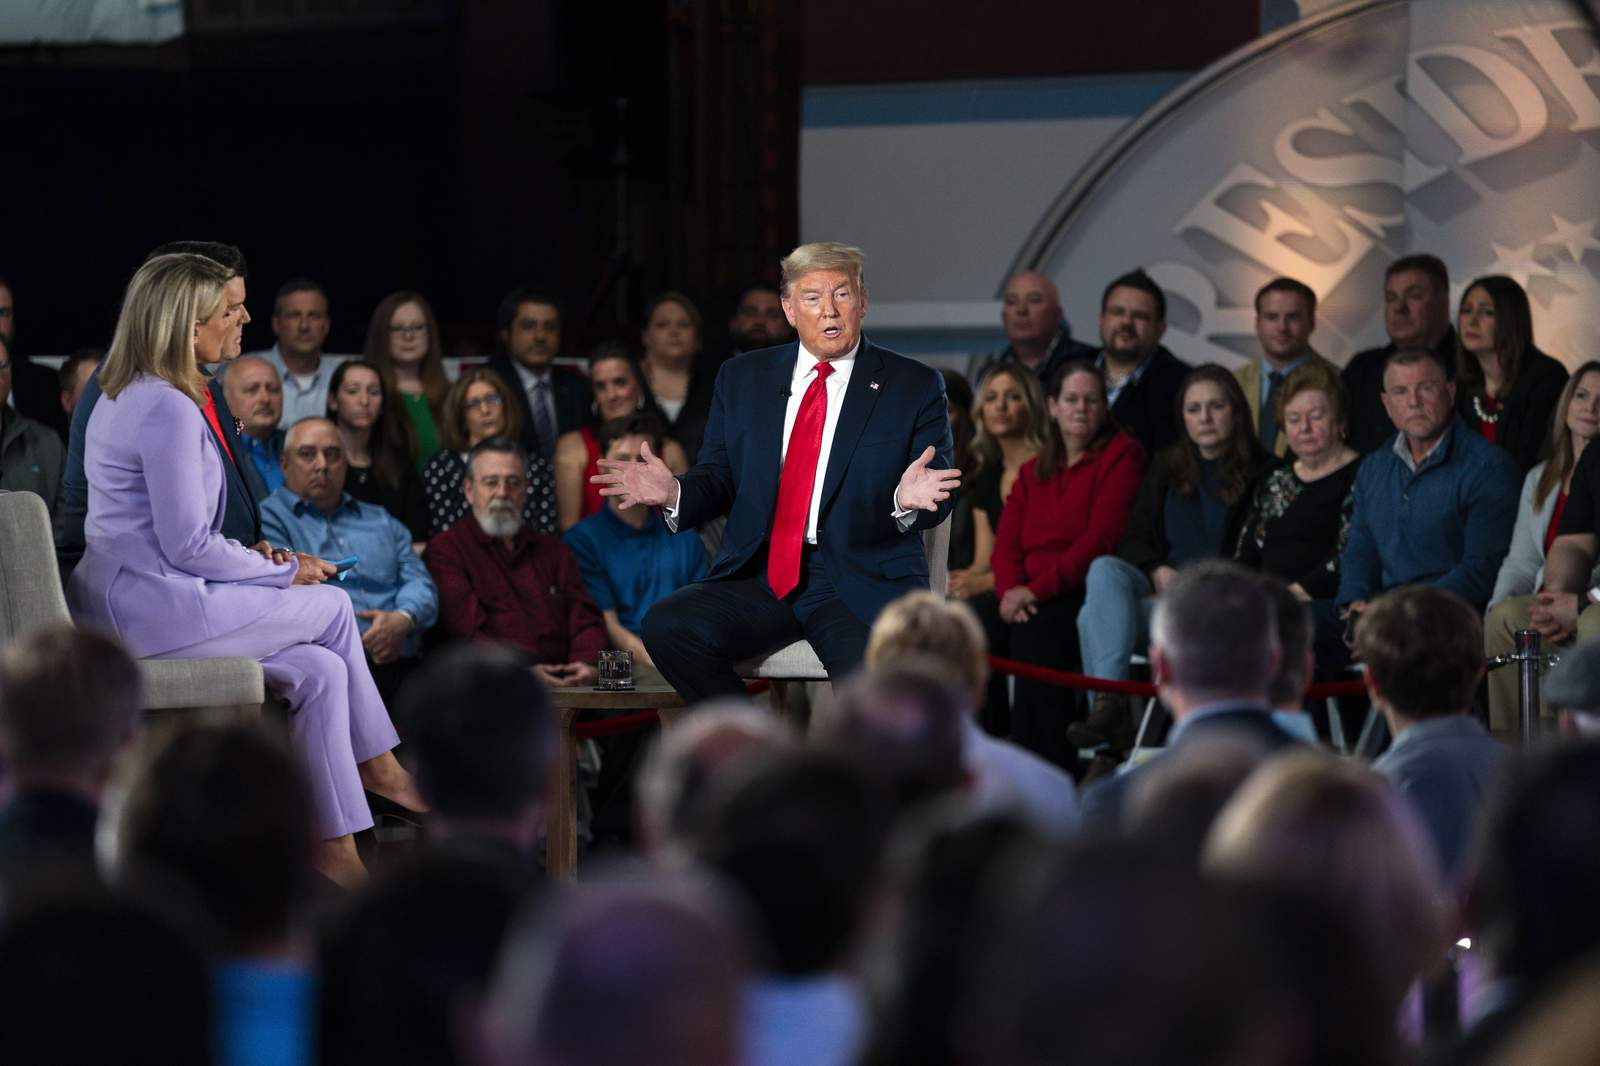 Halloween Events 2020 Scranton Pa Trump defends his rhetoric in 1st TV town hall of 2020